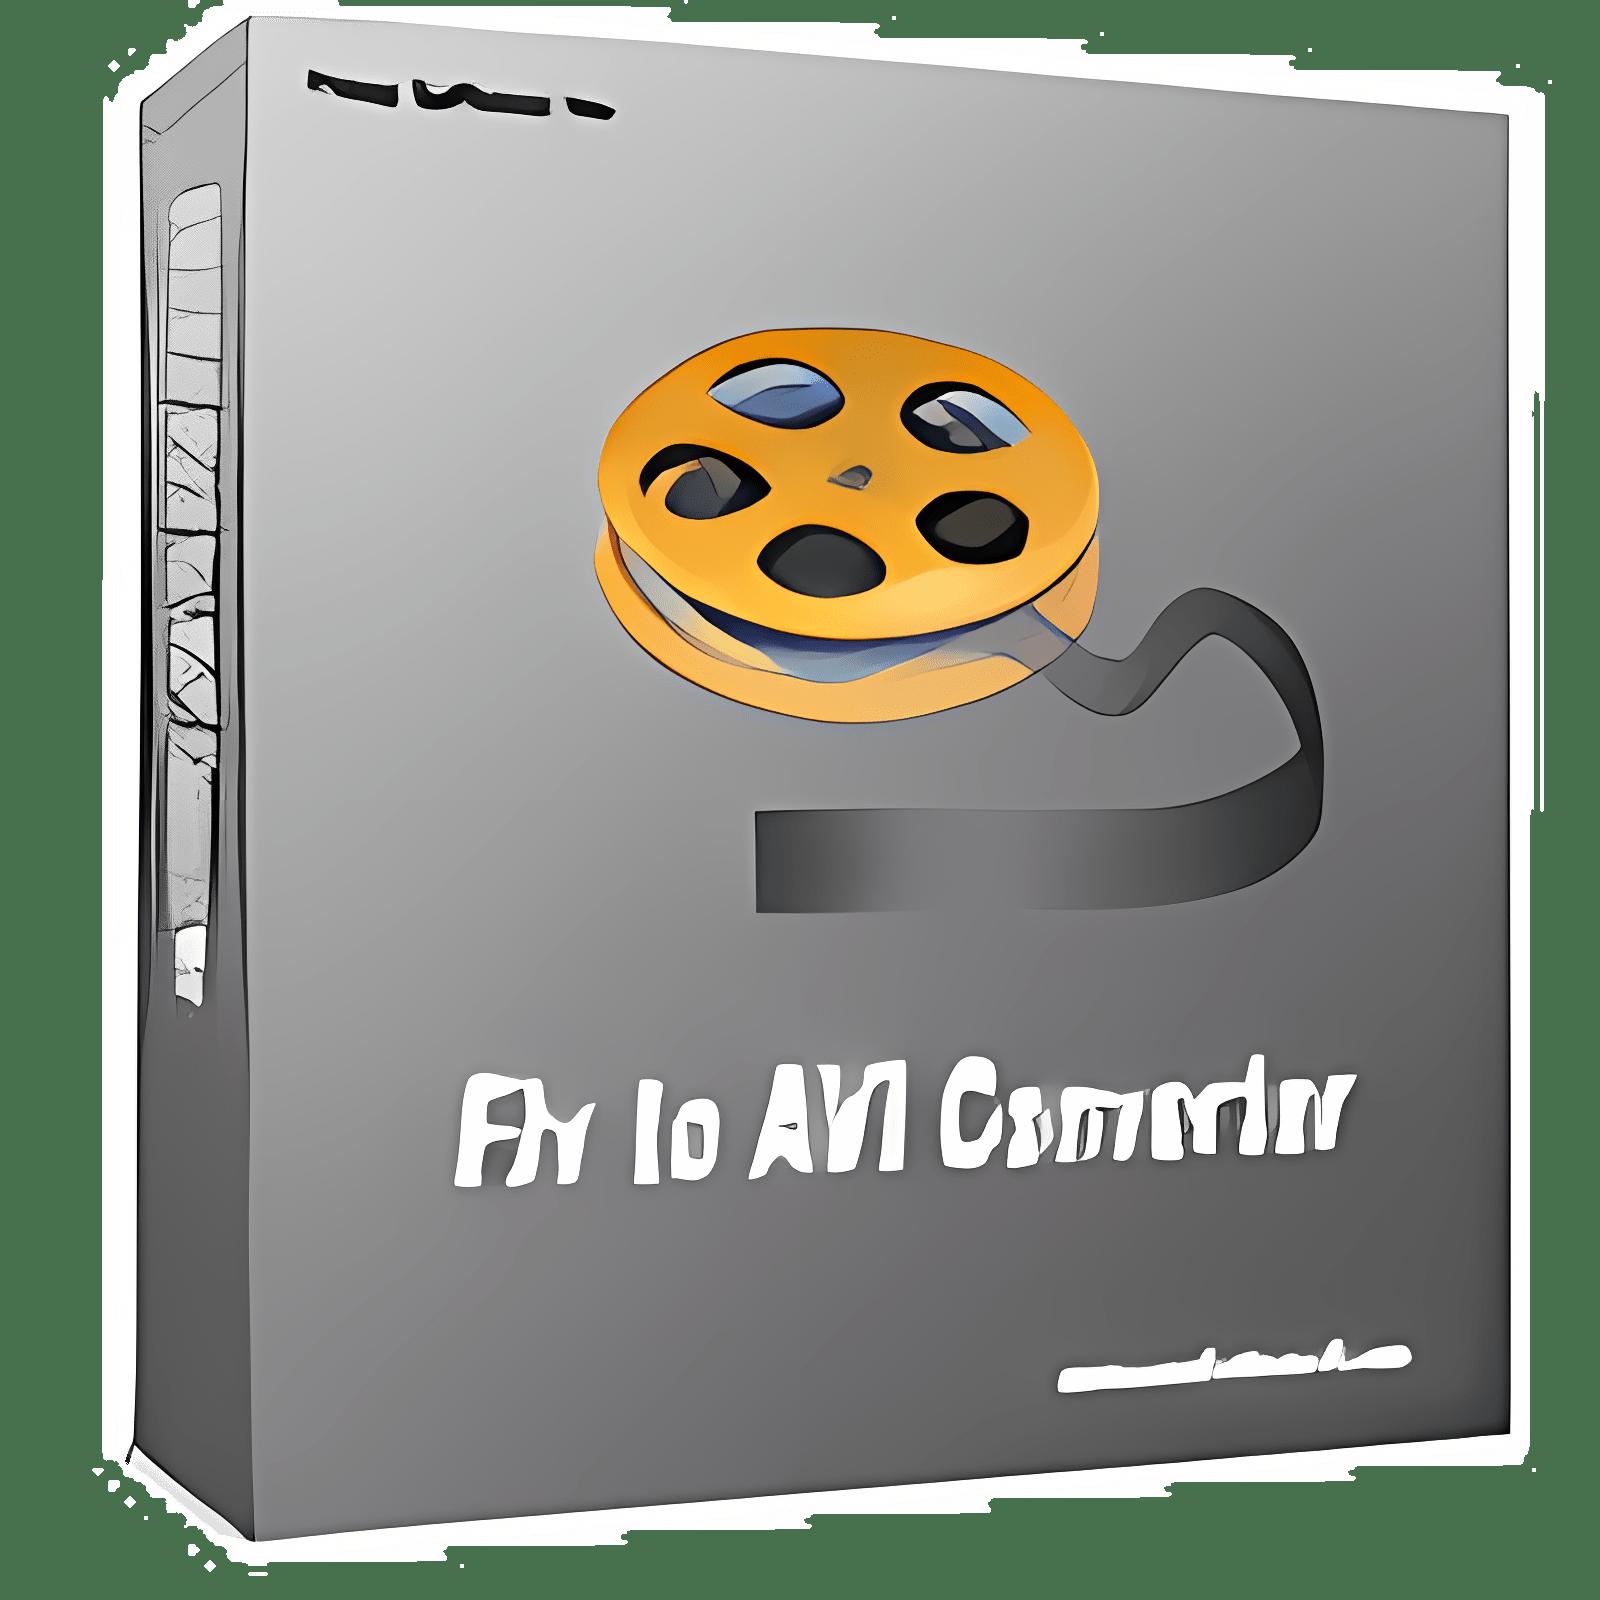 Freez Flv to AVI/MPEG/WMV Converter 1.6